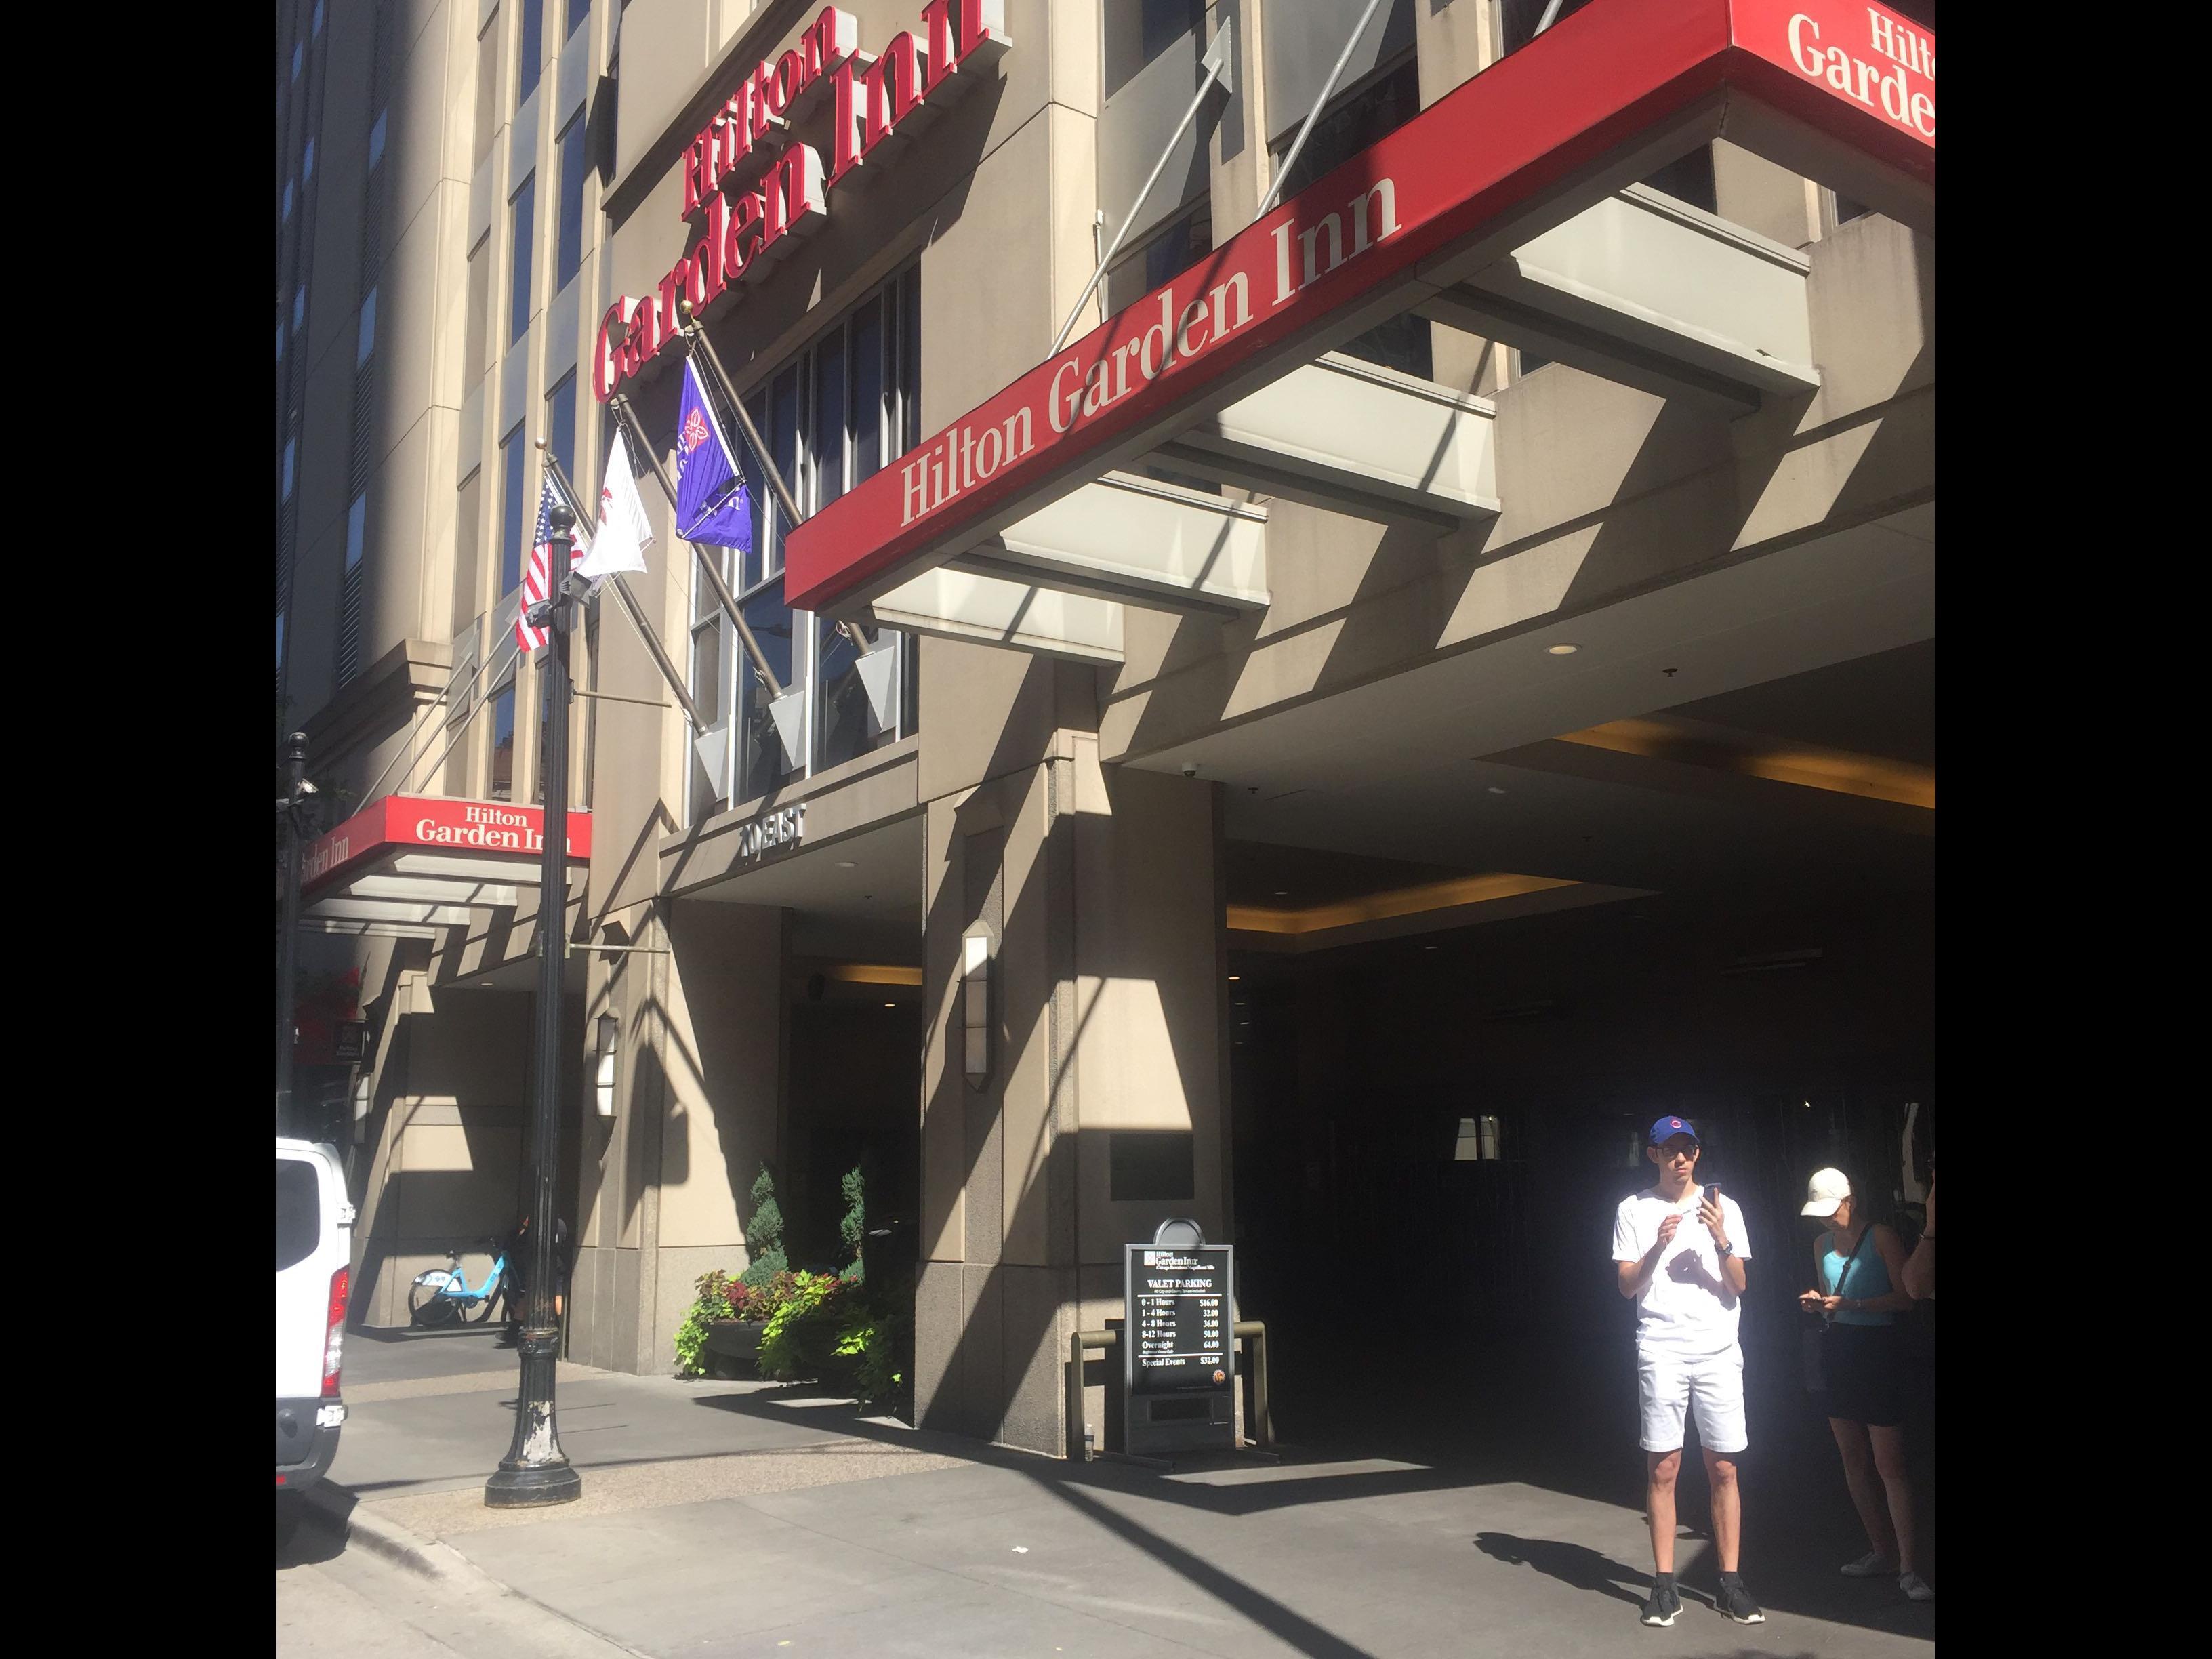 Hilton Garden Inn Parking In Chicago Parkme